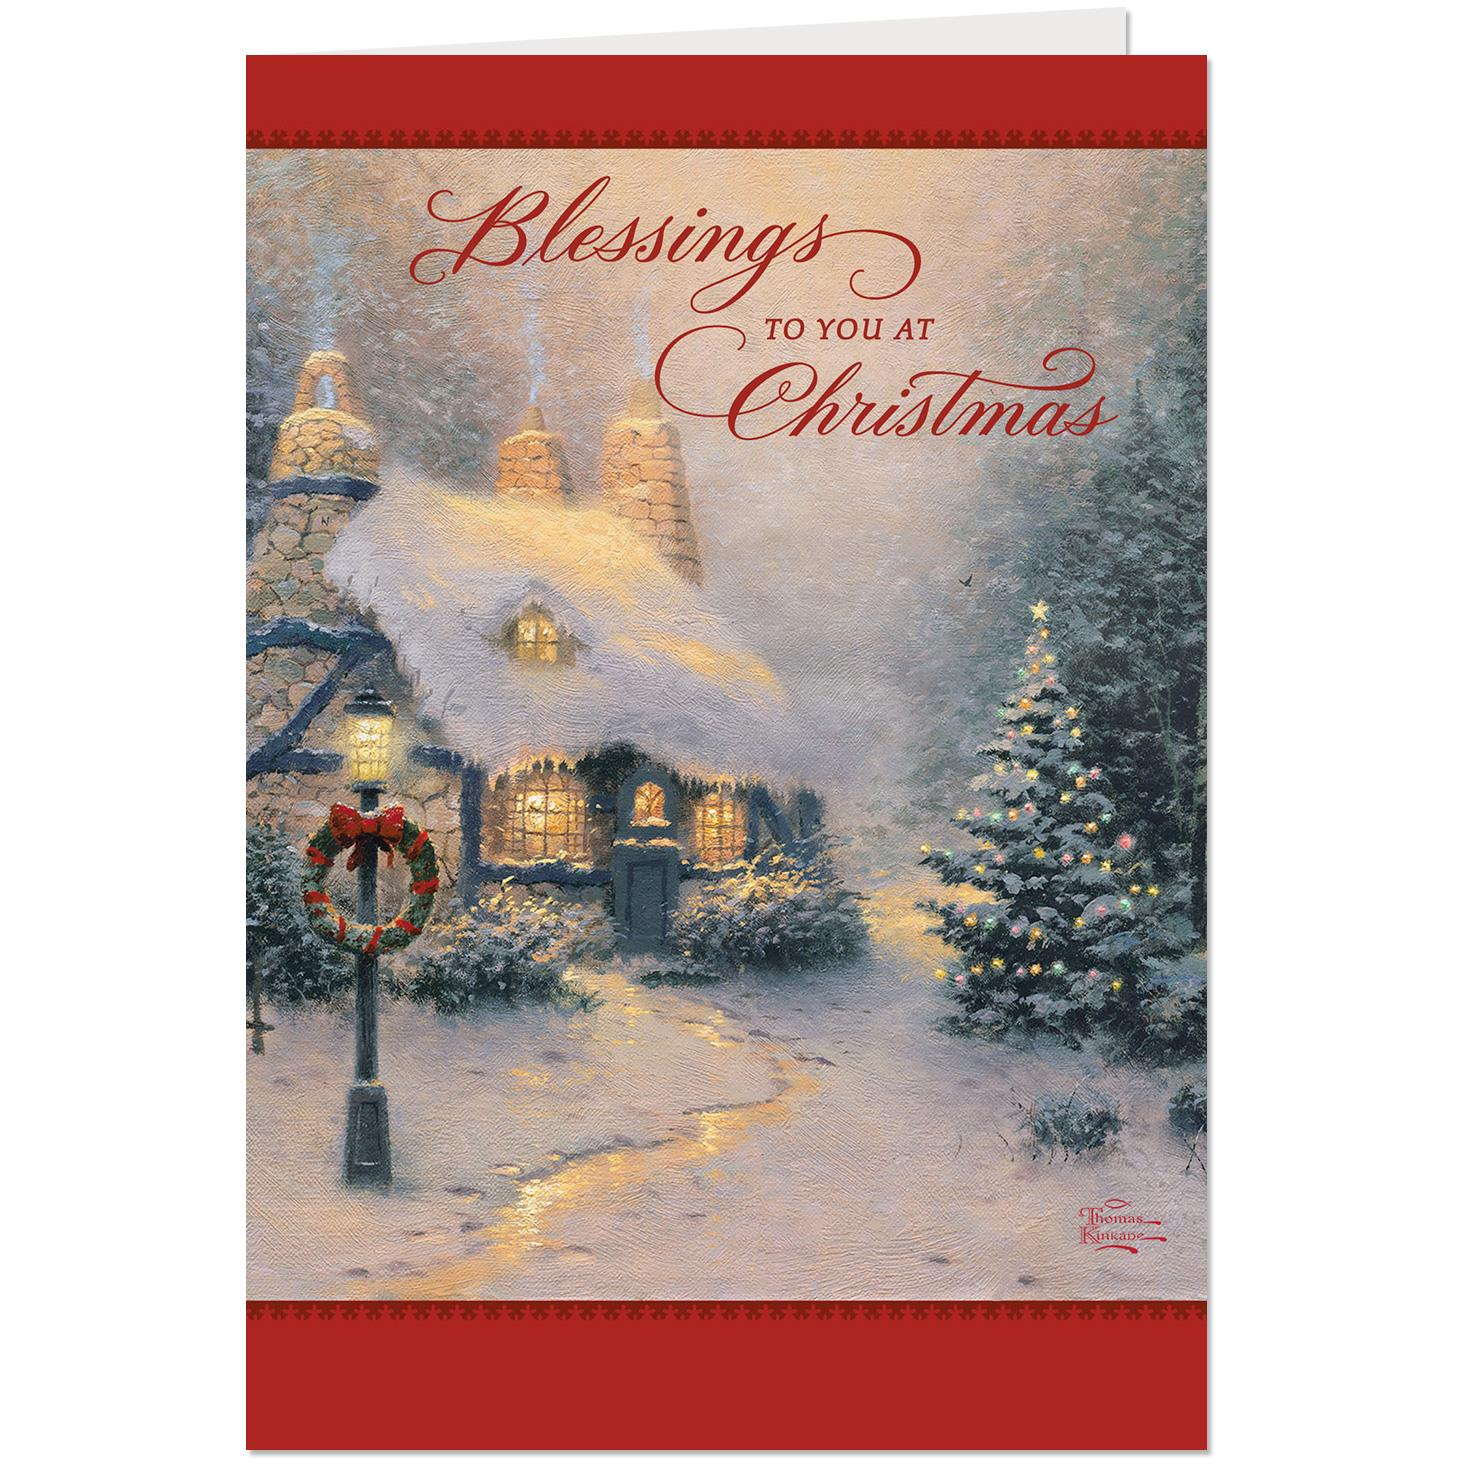 Thomas Kinkade Christmas Cards Pack Of 10 Boxed Cards